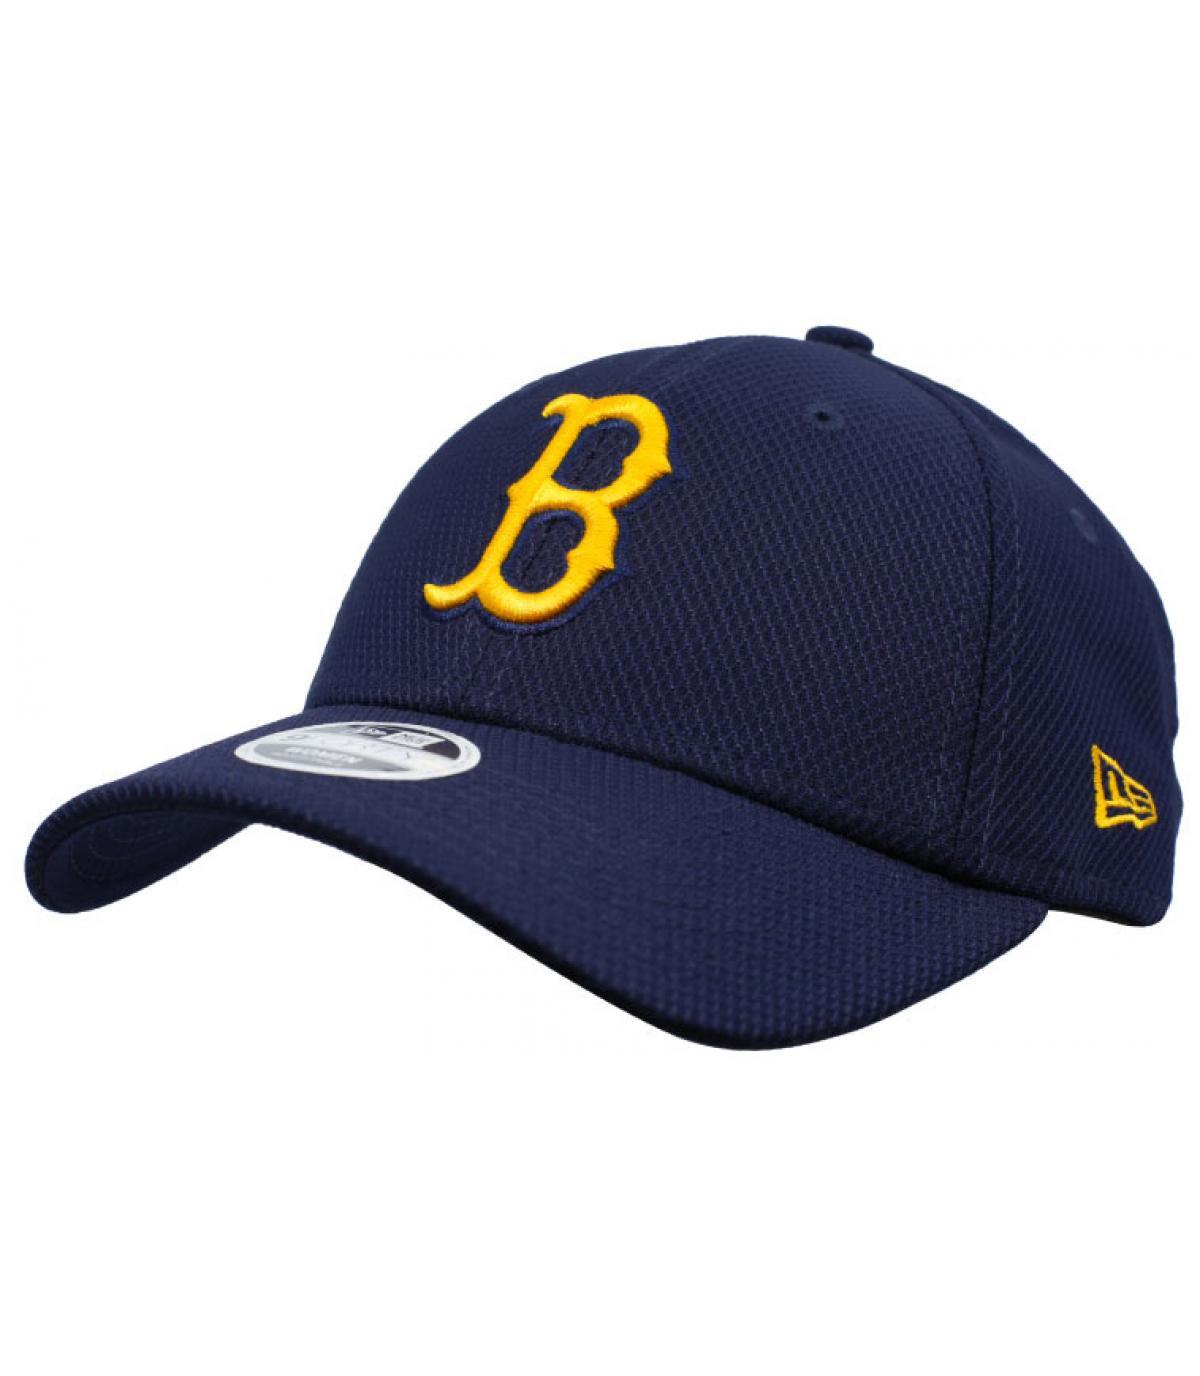 Details Cap  Wmns Diamond Era Boston 9Forty navy gold - Abbildung 2